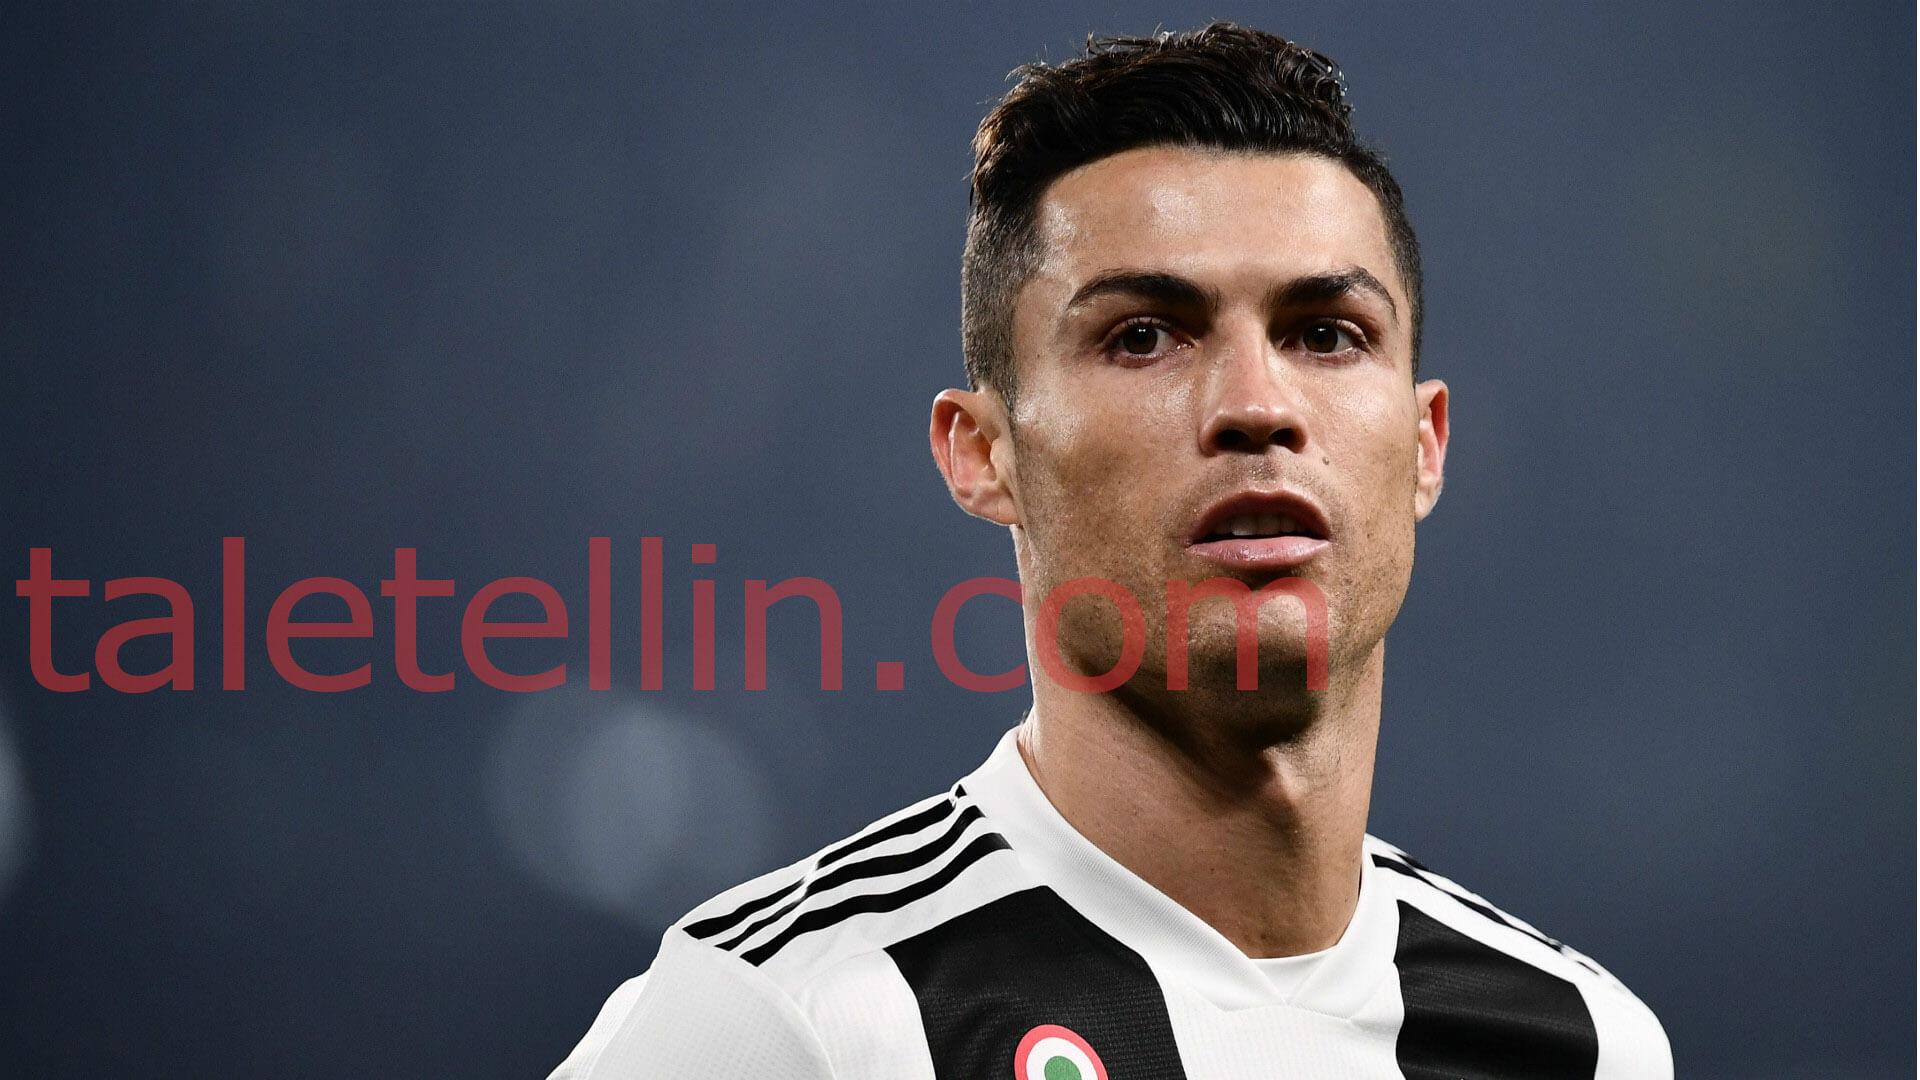 Ronaldo ได้วิจารณ์การกลับมาของฟุตบอล